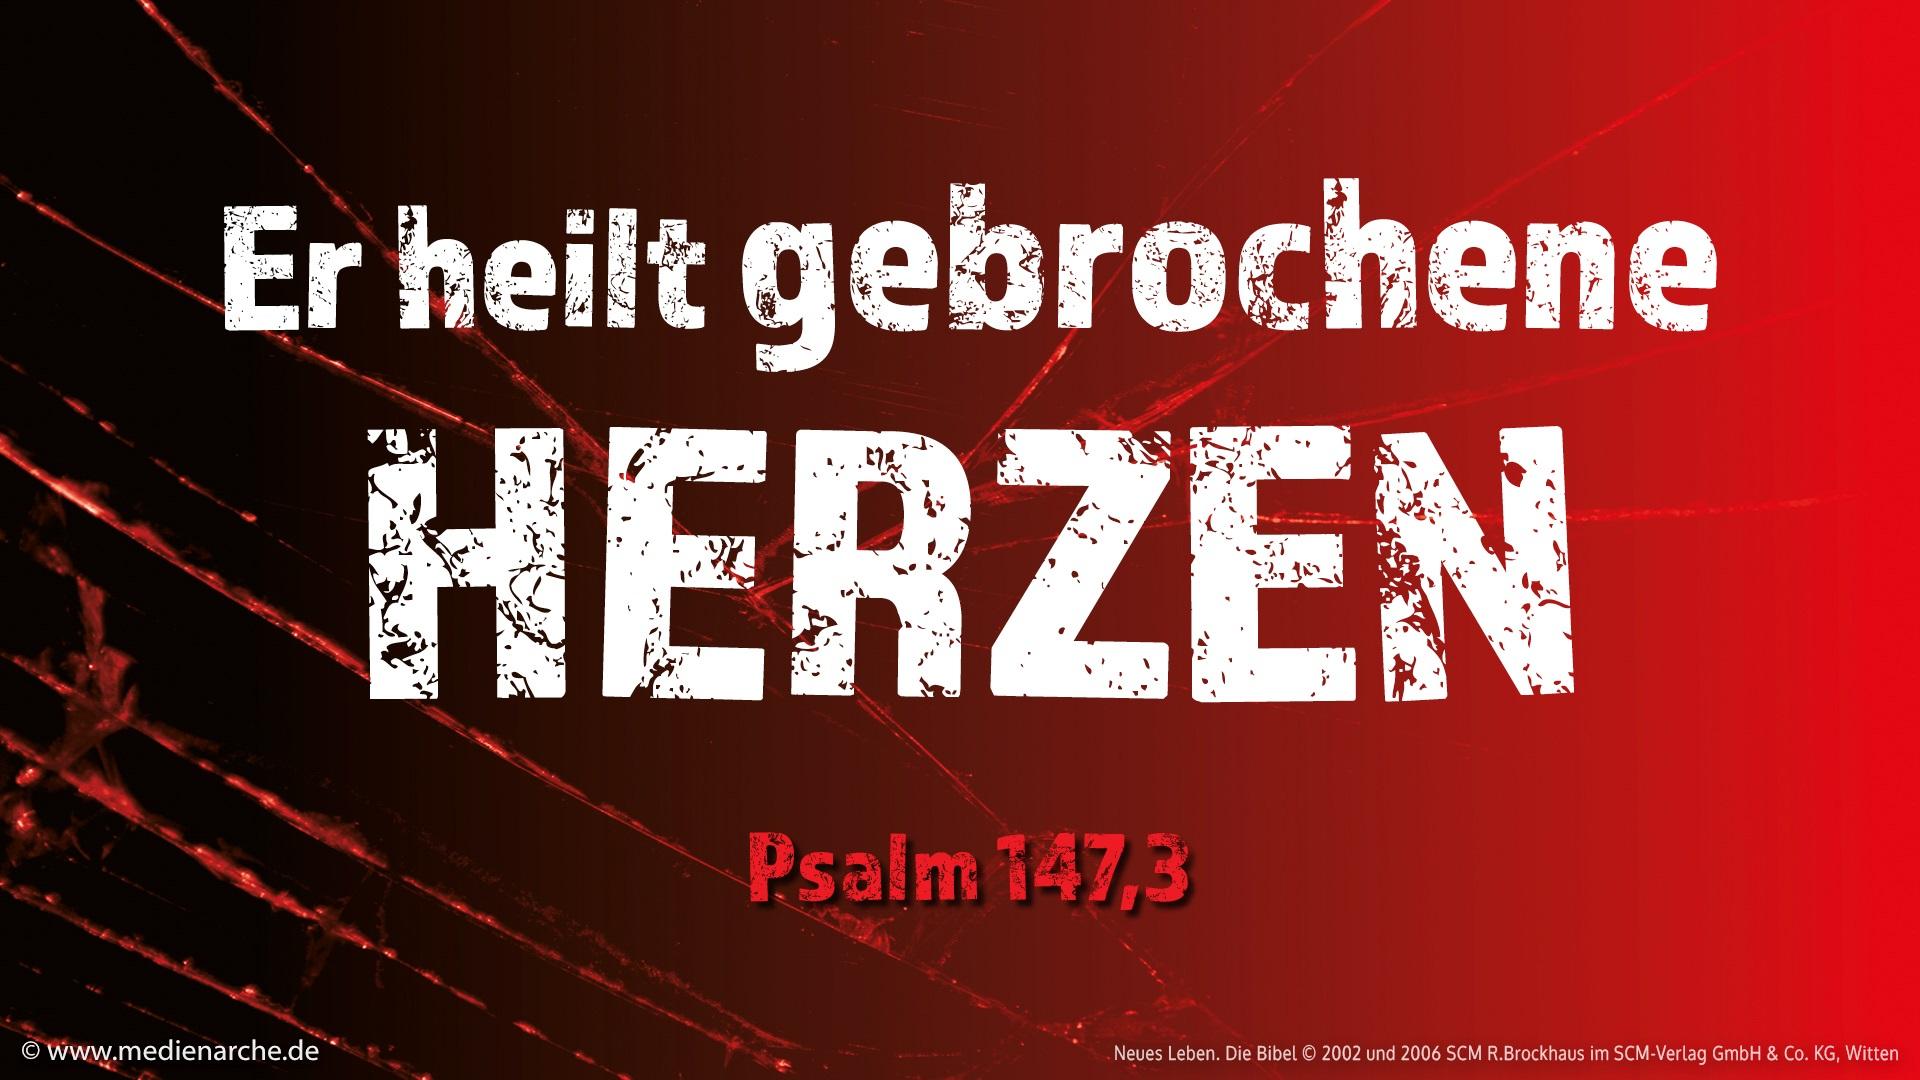 psalm-147-3_16_9_hd1080.jpg